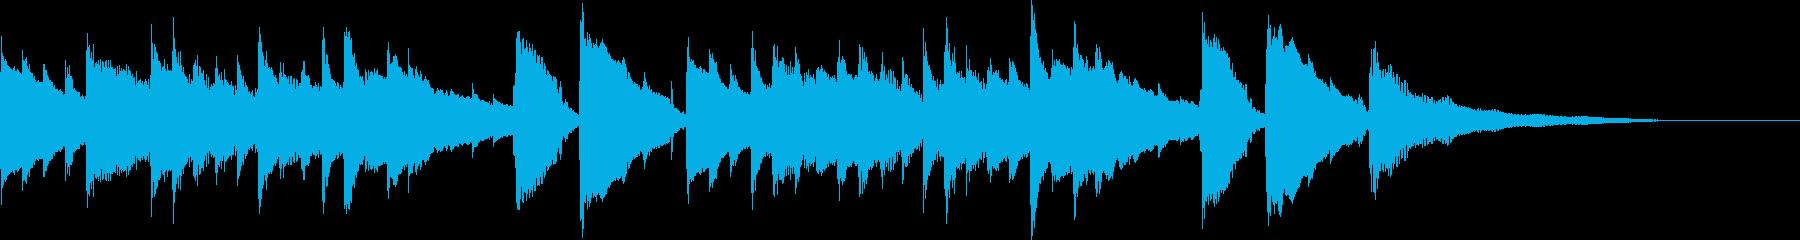 CM30秒、感動的なアコギとグロッケンの再生済みの波形